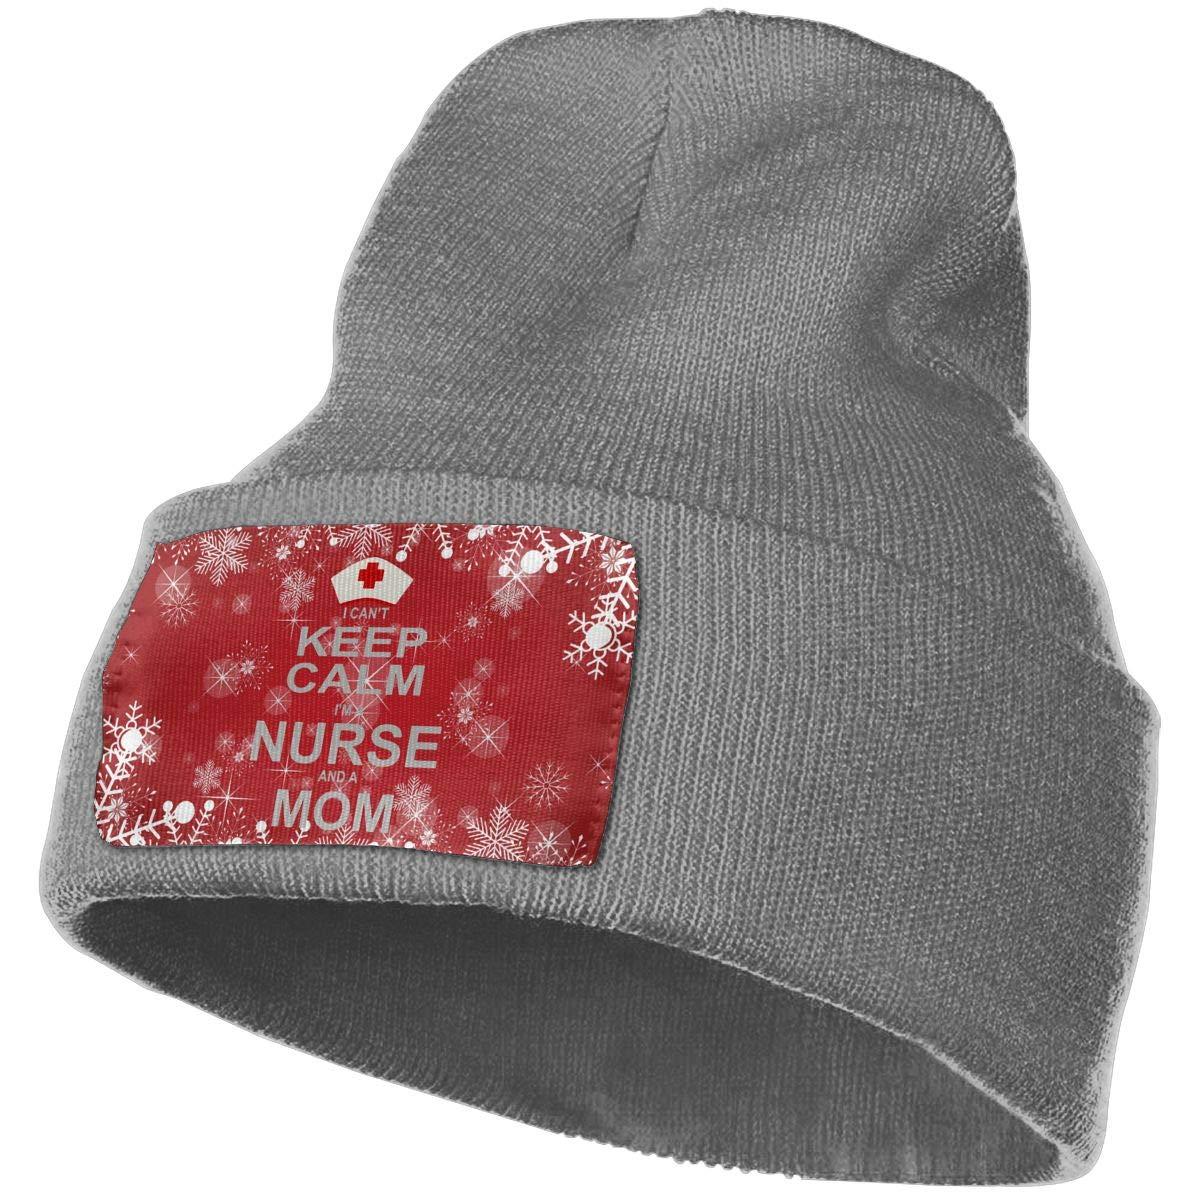 Keep Calm Im A Nurse and A Mom Men Women Knit Hats Stretchy /& Soft Skull Cap Beanie